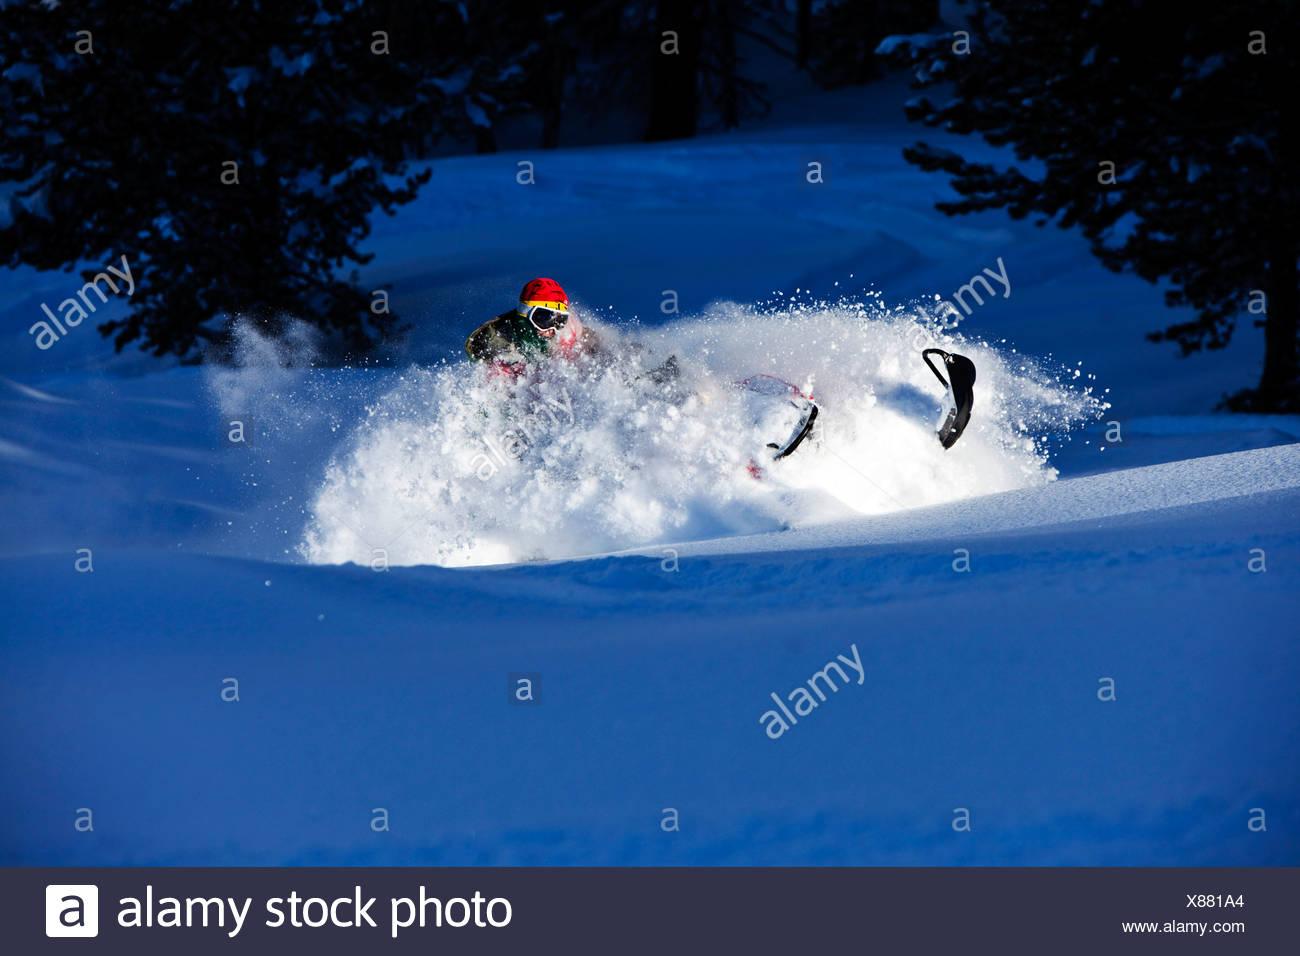 A snowmobiler boon docks powder turns in Colorado. - Stock Image